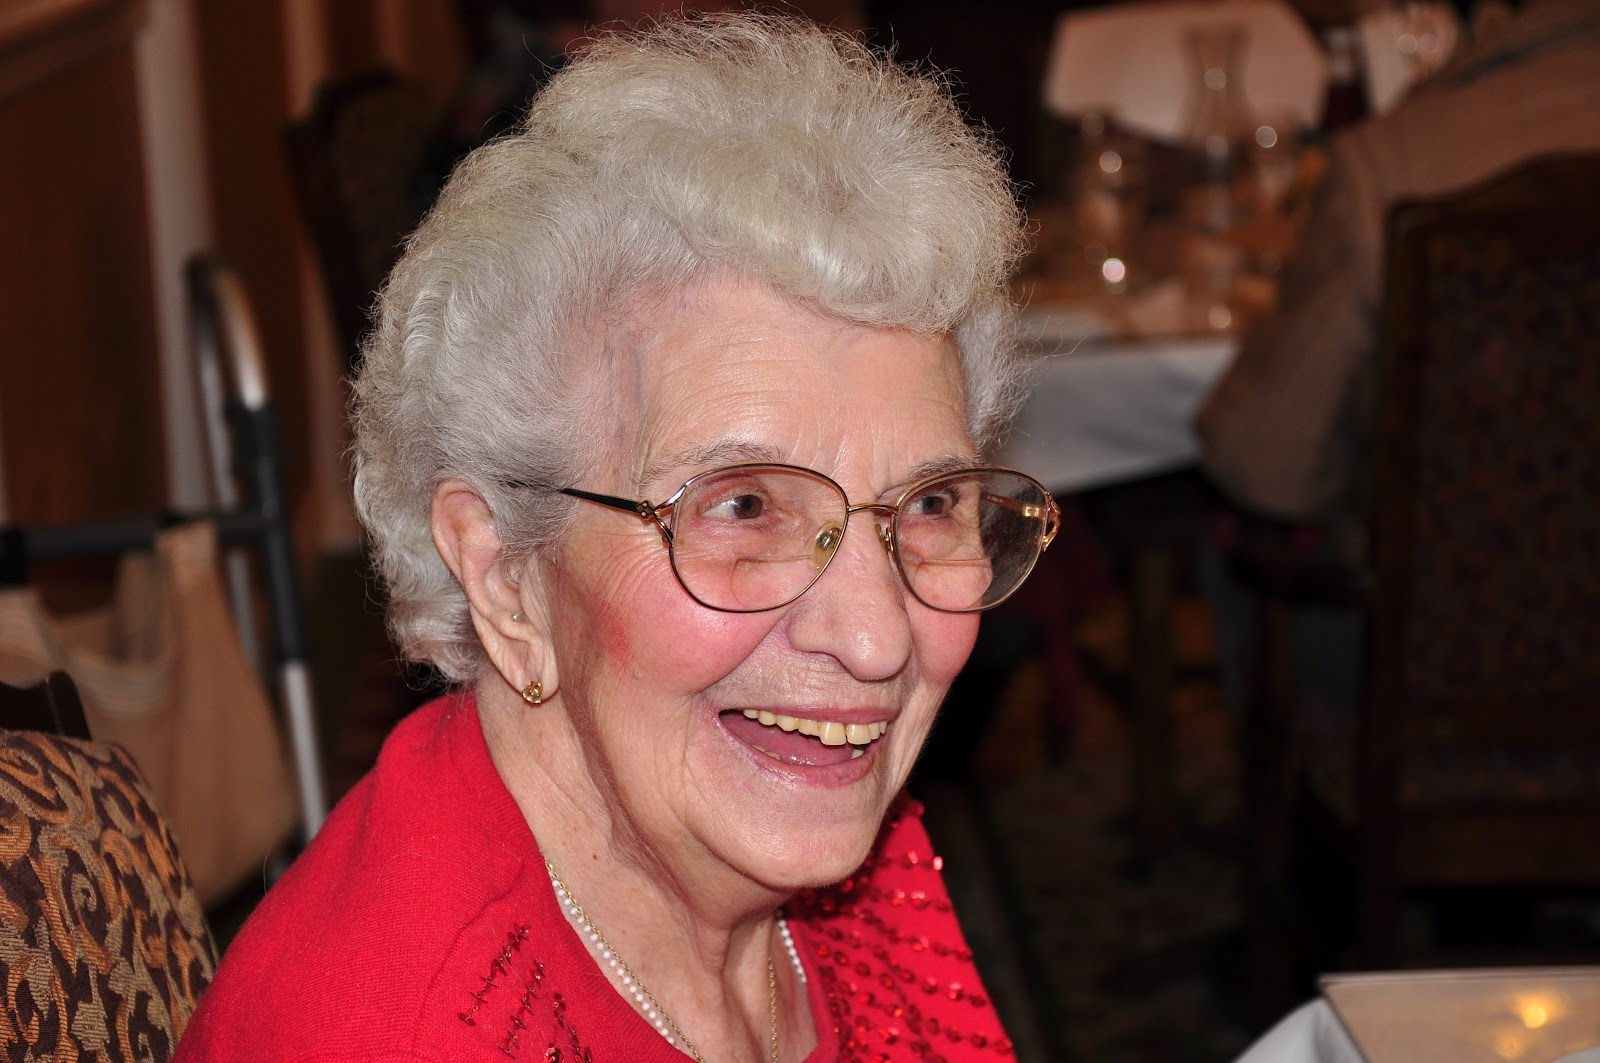 My Great Grandma is 100